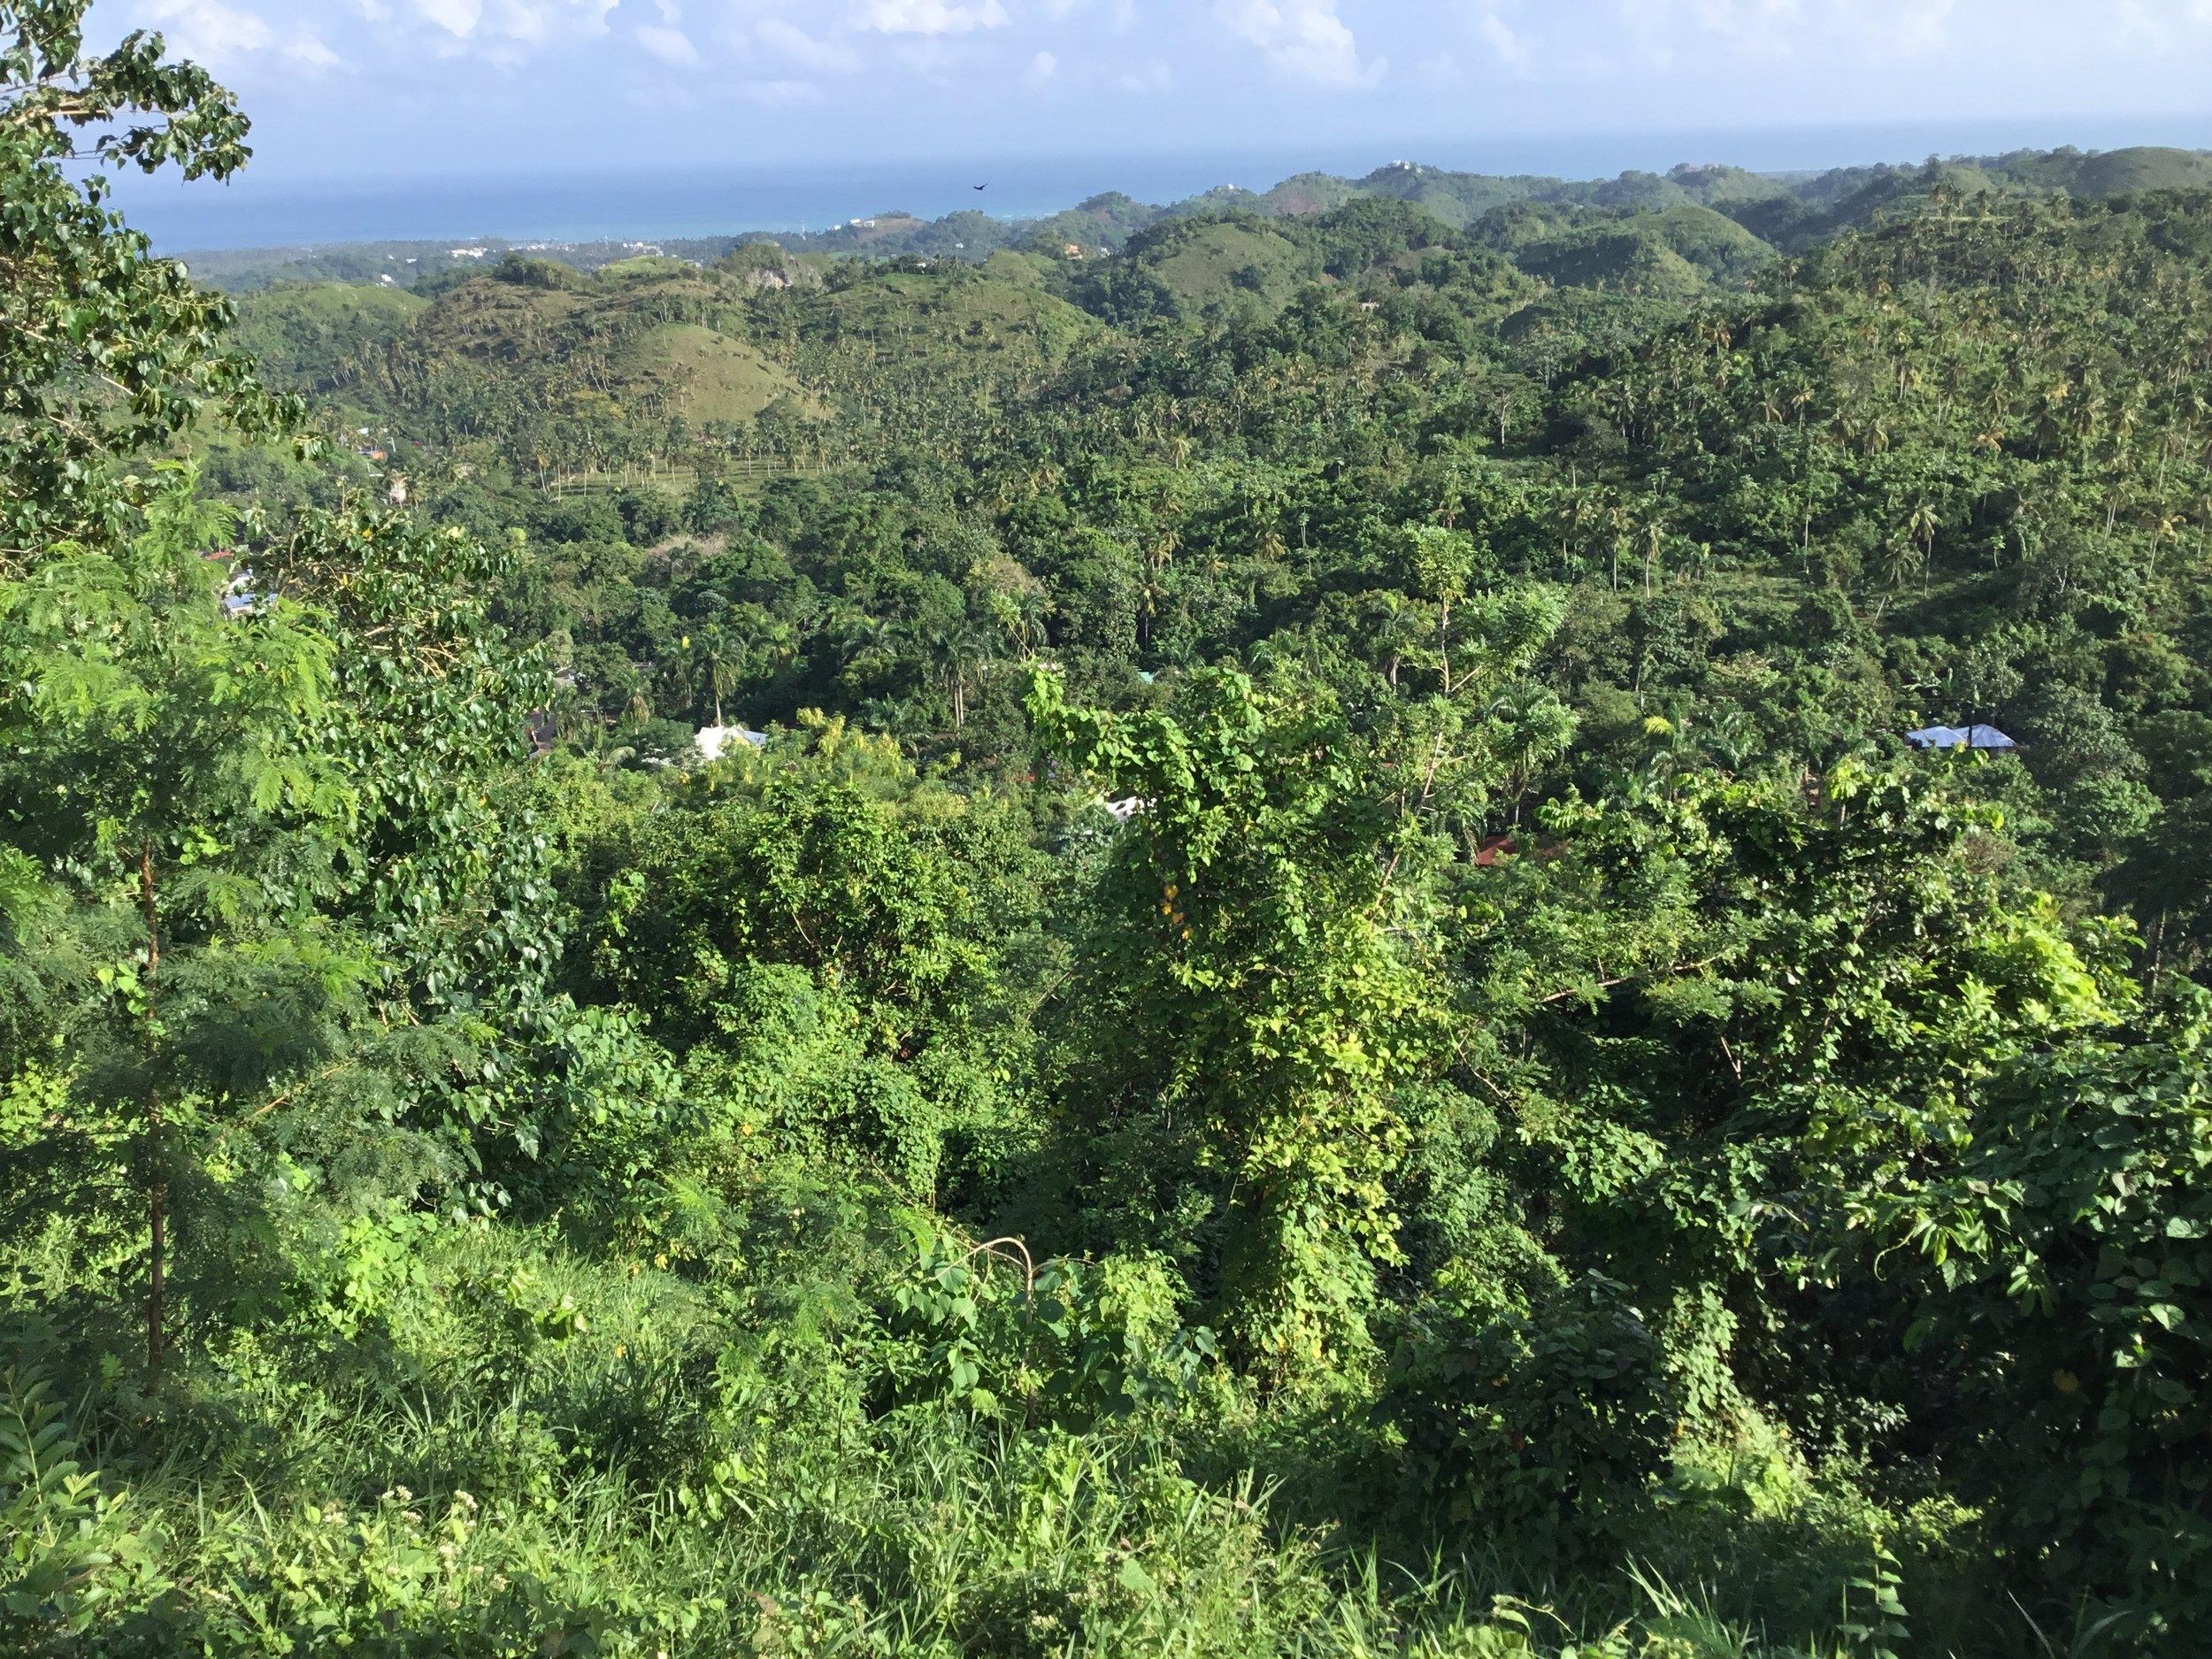 Land for Sale Las Terrenas Garen4.jpeg